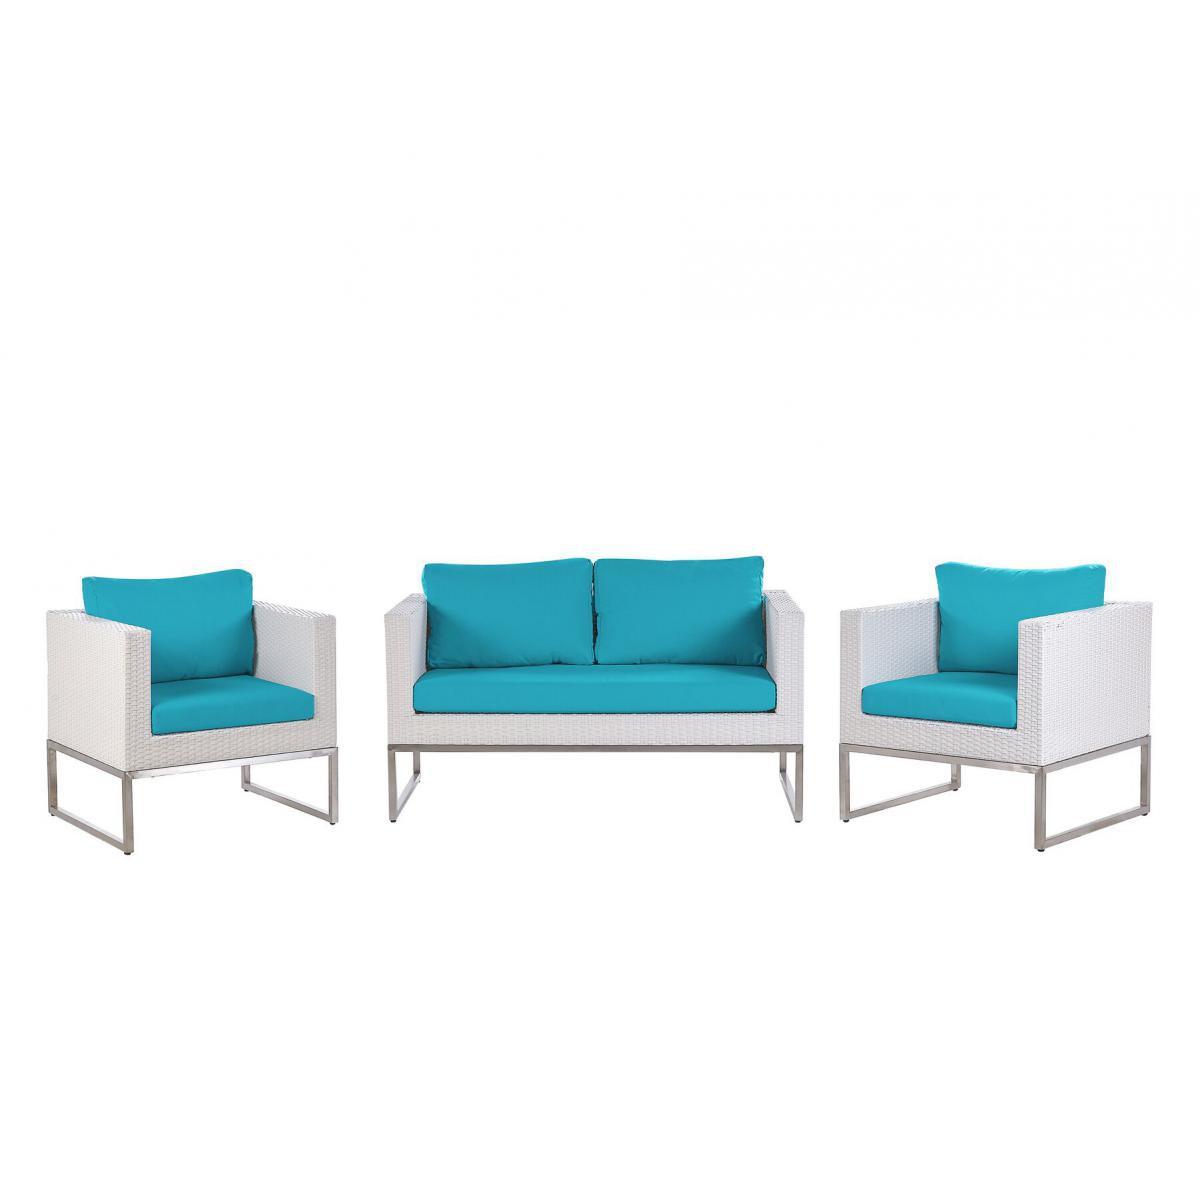 Beliani Beliani Salon de jardin 4 places en rotin blanc avec coussins bleus CREMA - marron